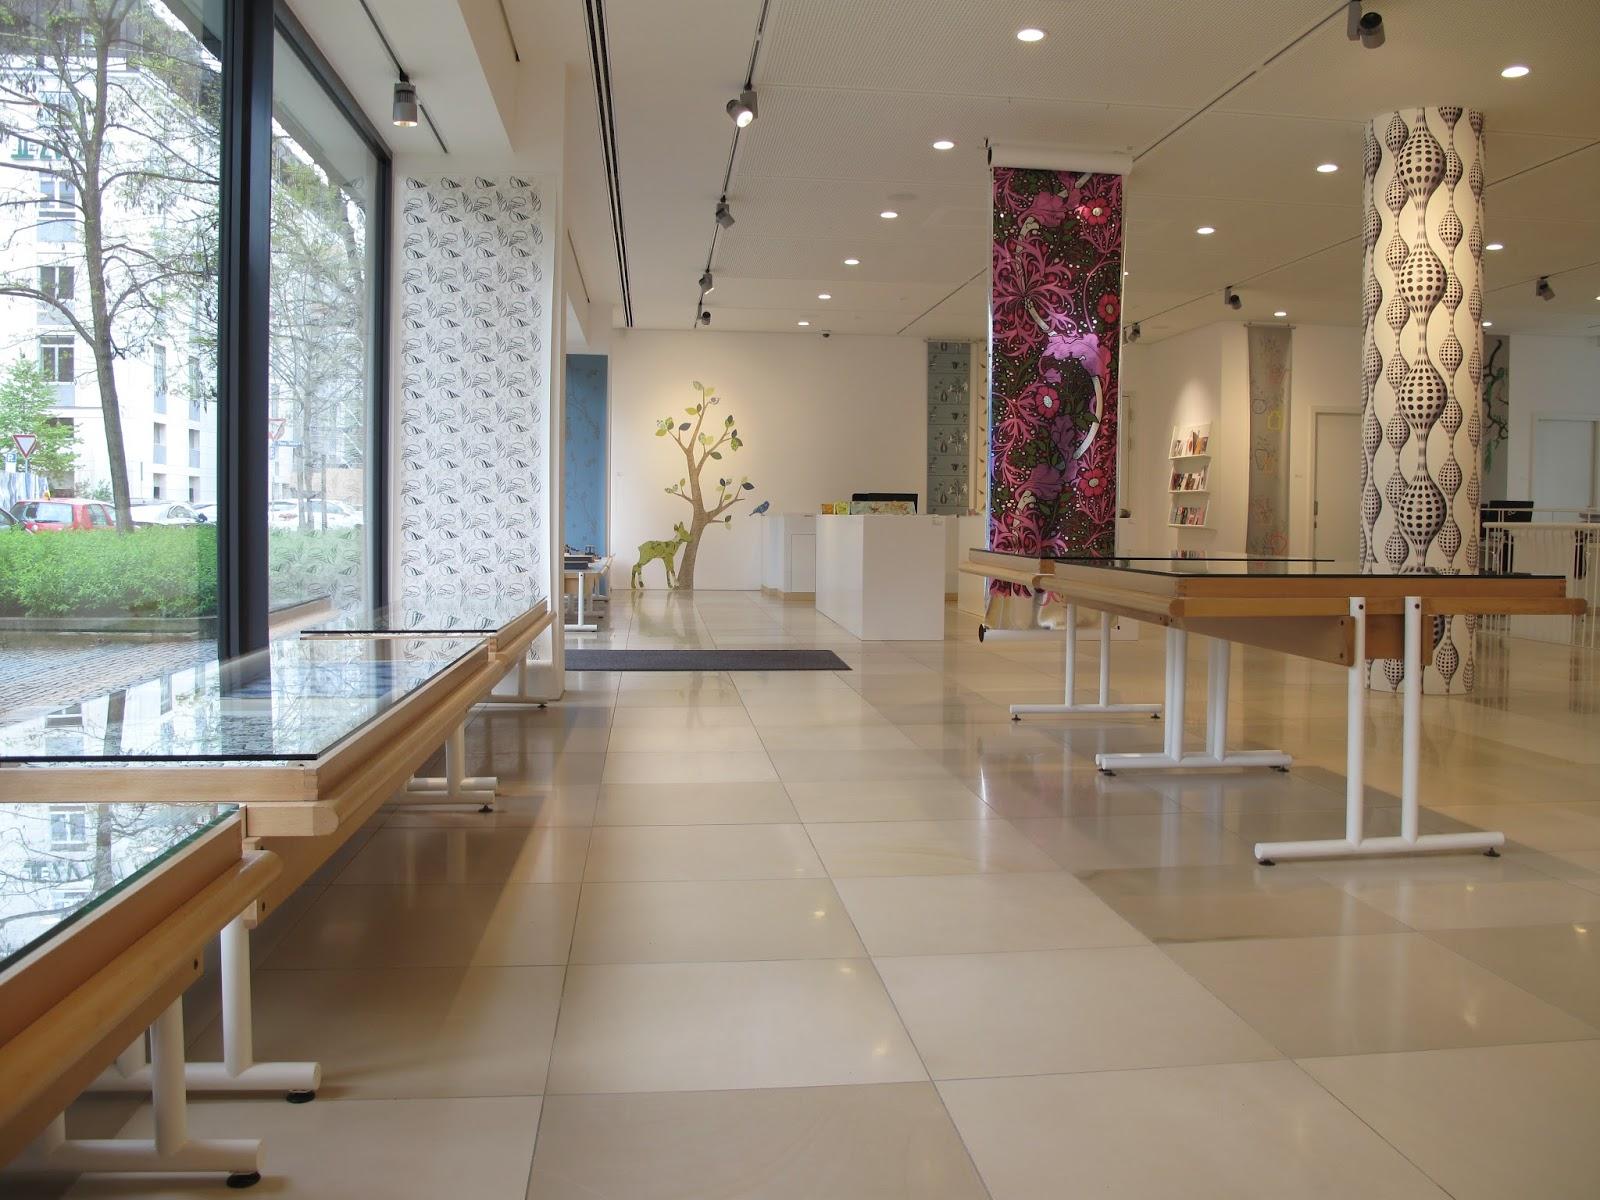 Tapeten München inke exposition galerie handwerk münchen tapeten